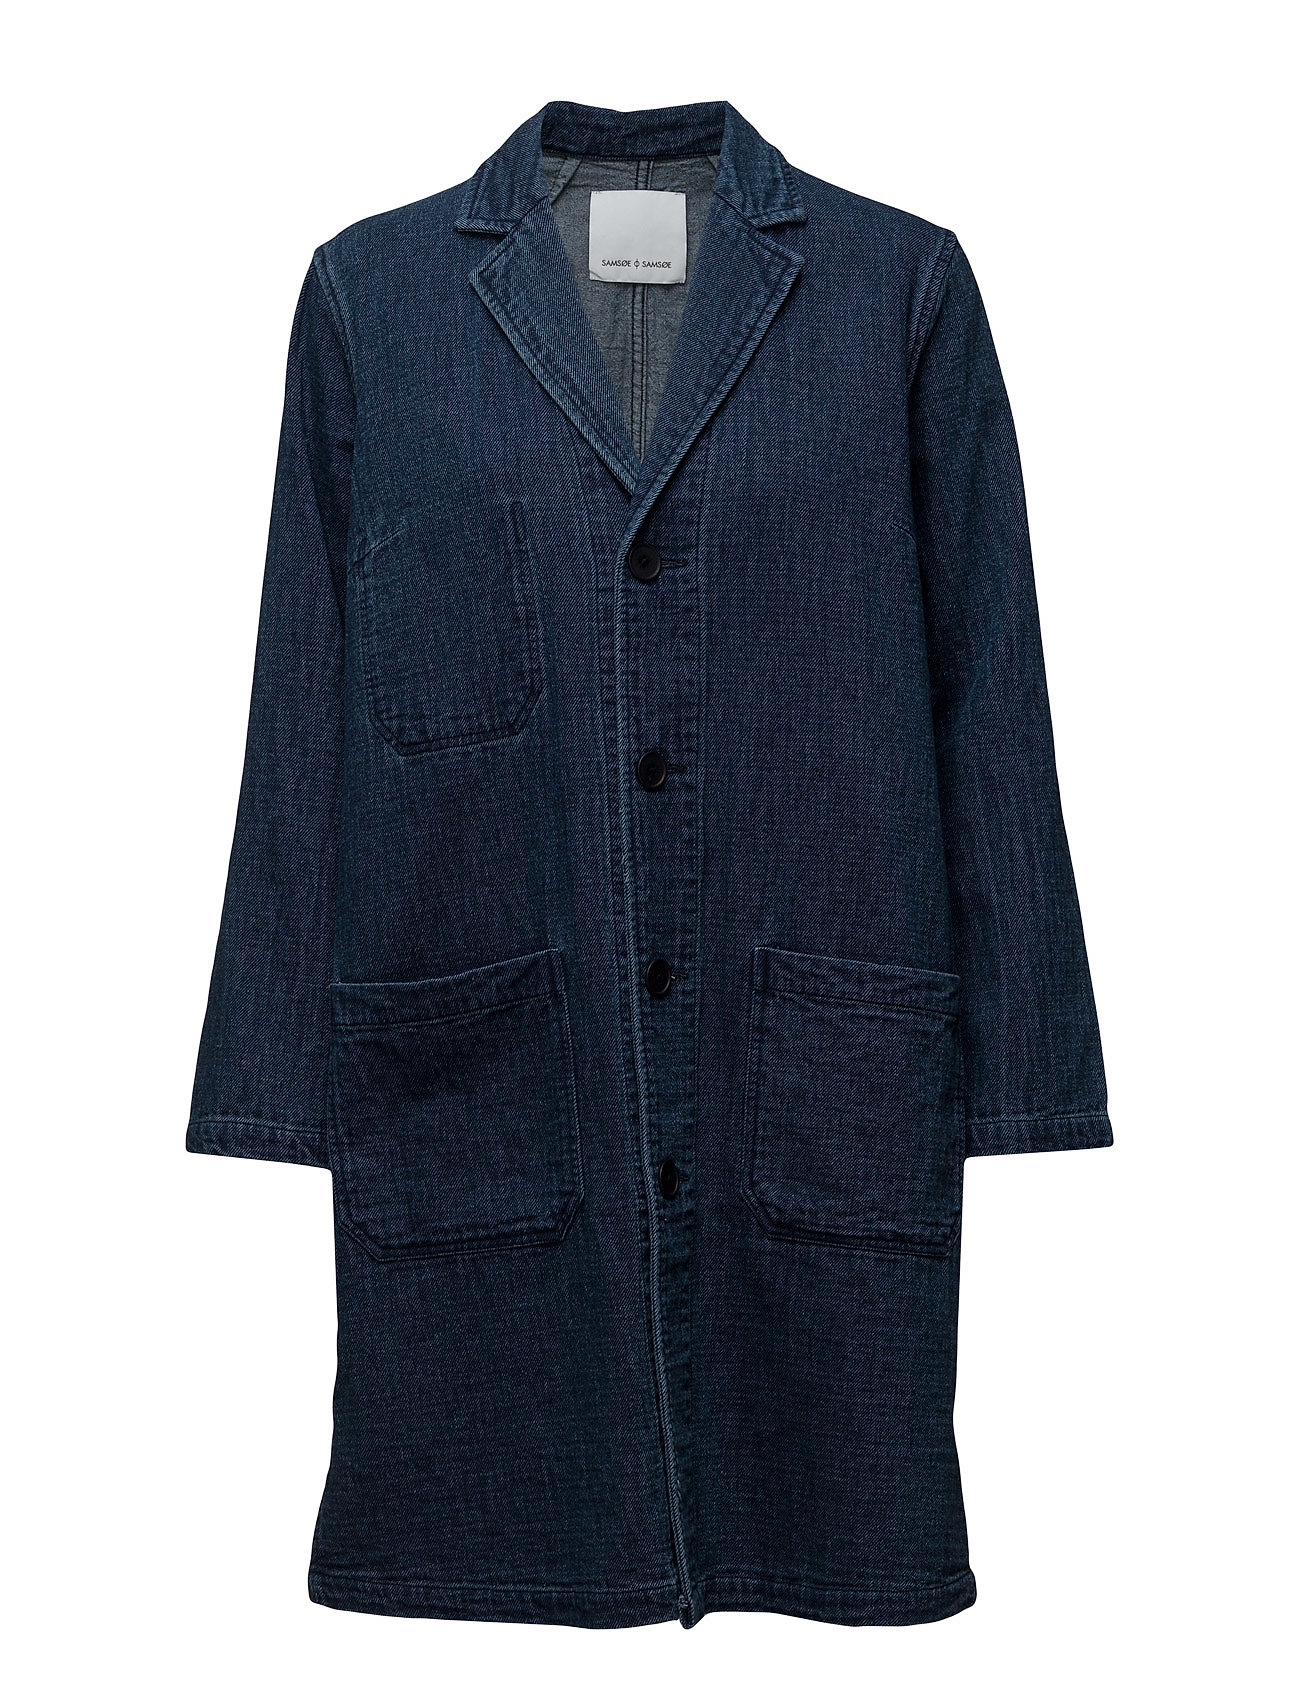 Chore Coat 7748 Samsøe & Samsøe Jakker til Damer i